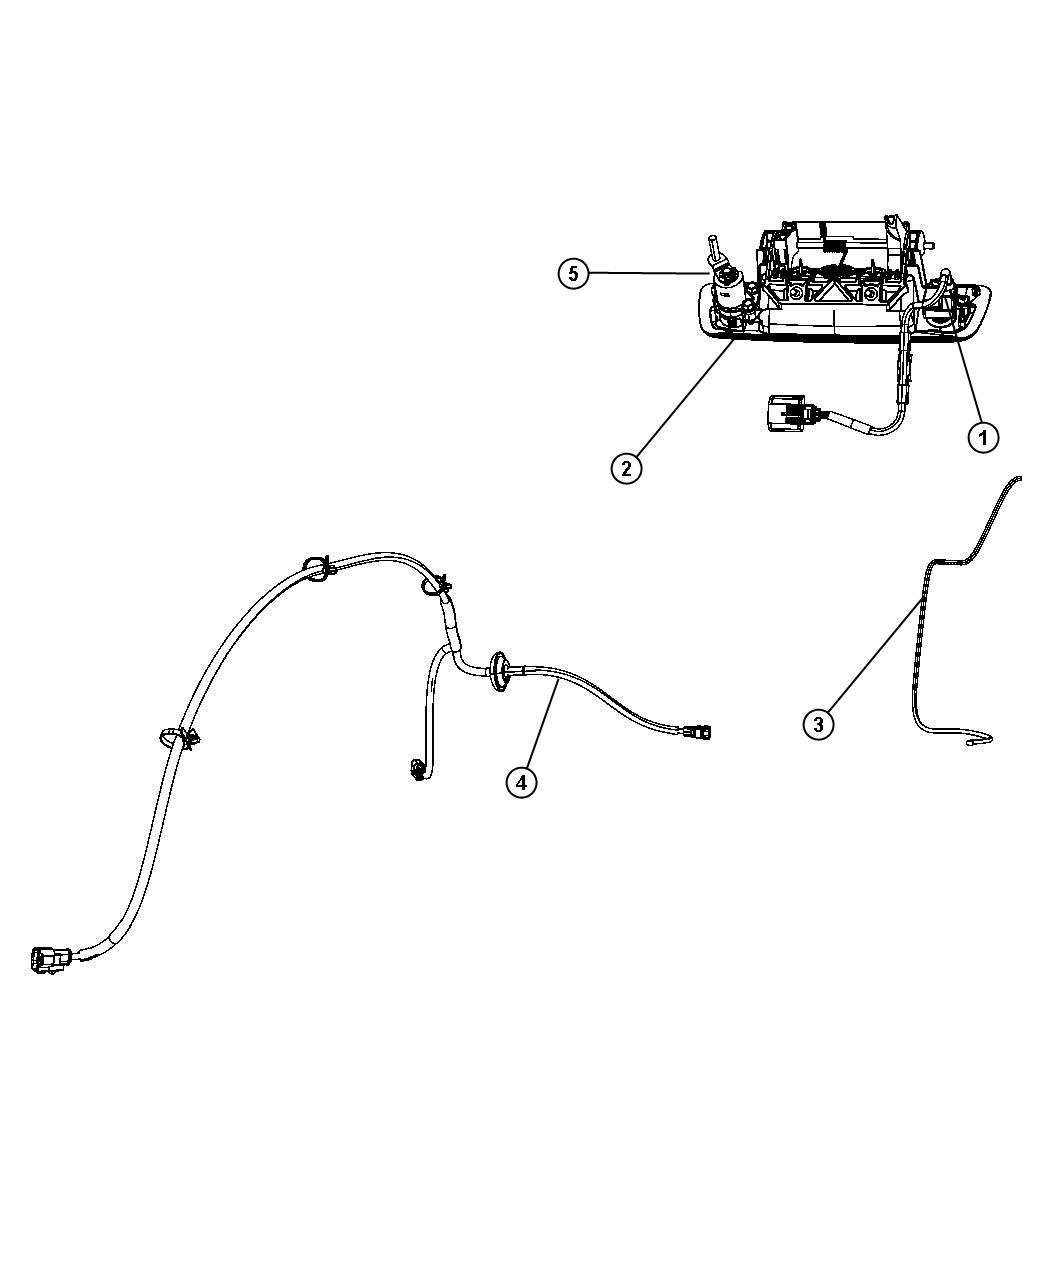 Dodge Ram 1500 Cylinder. Tailgate lock. Tailgateparkviewtm